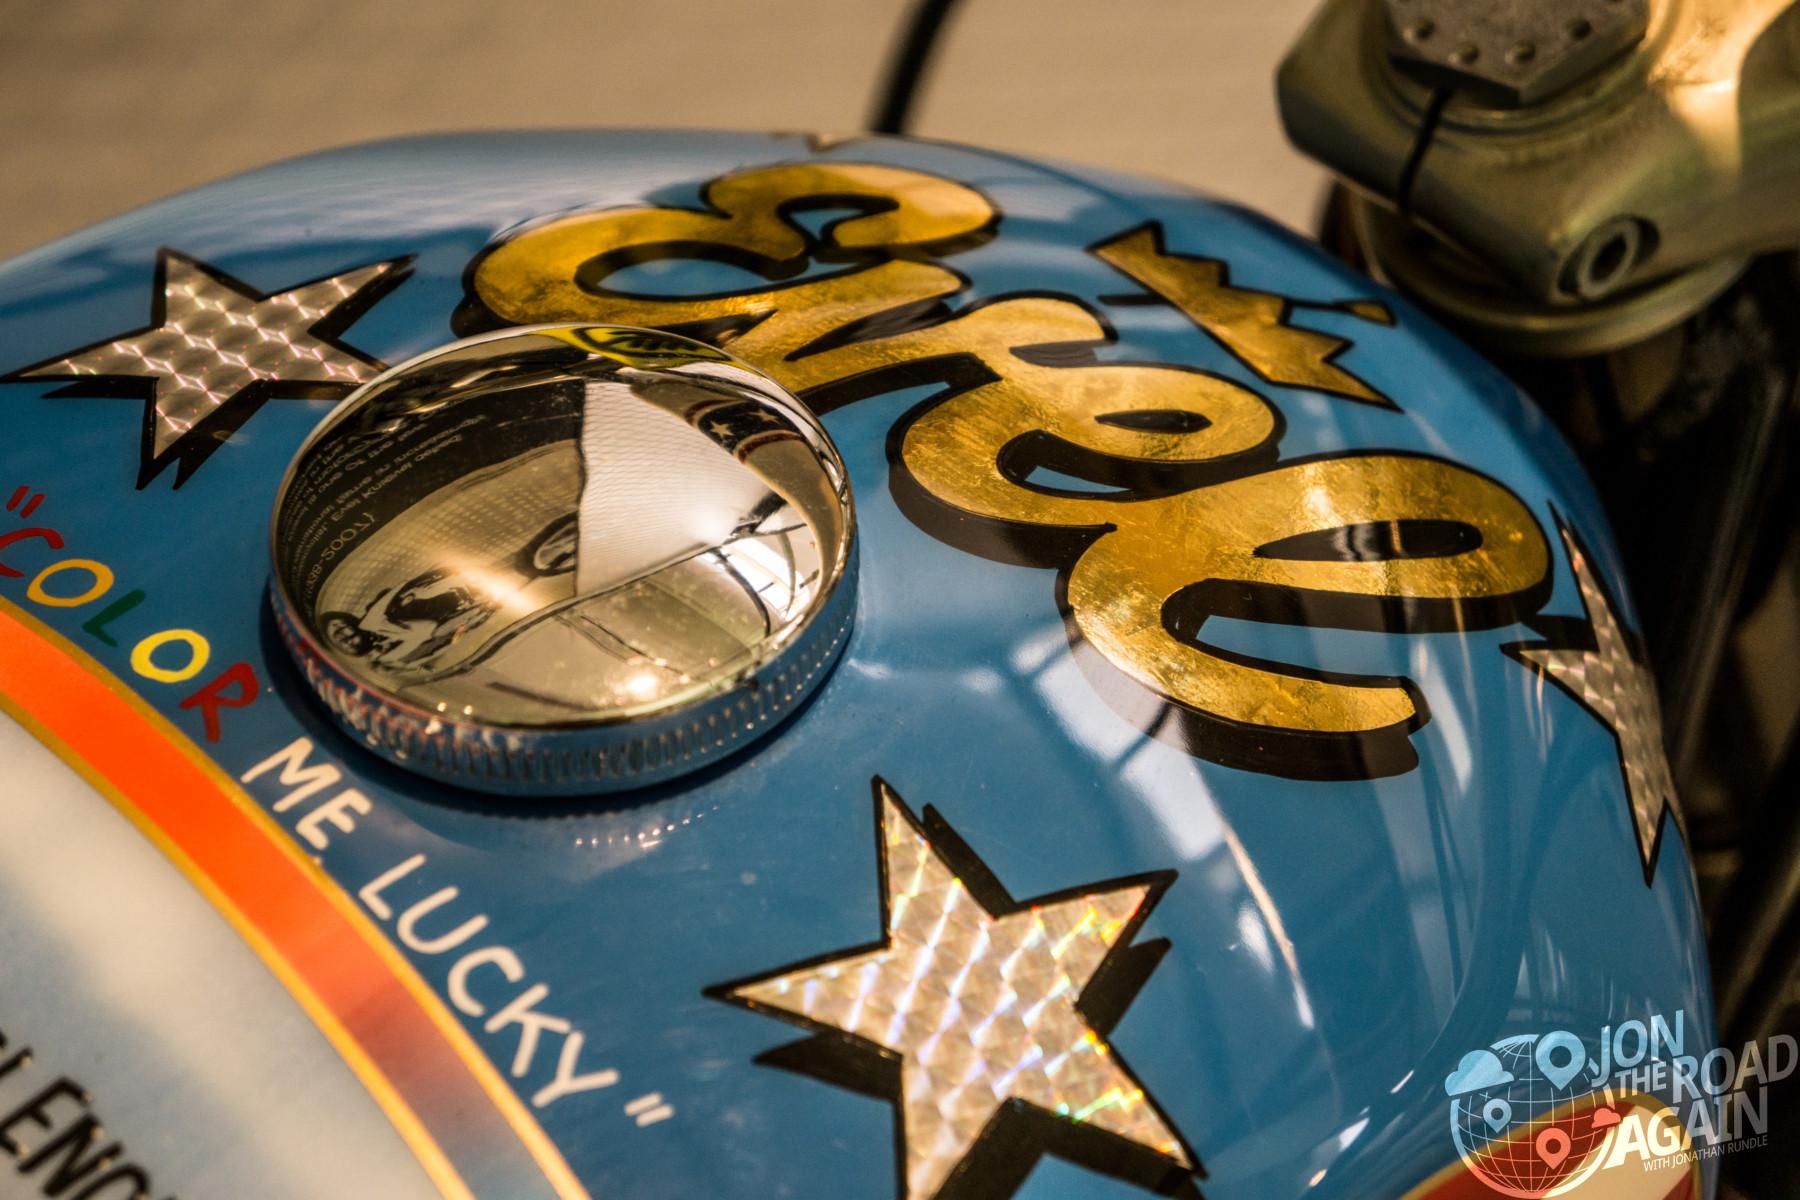 Evel Knievel Harley Motorcycle Gas Tank